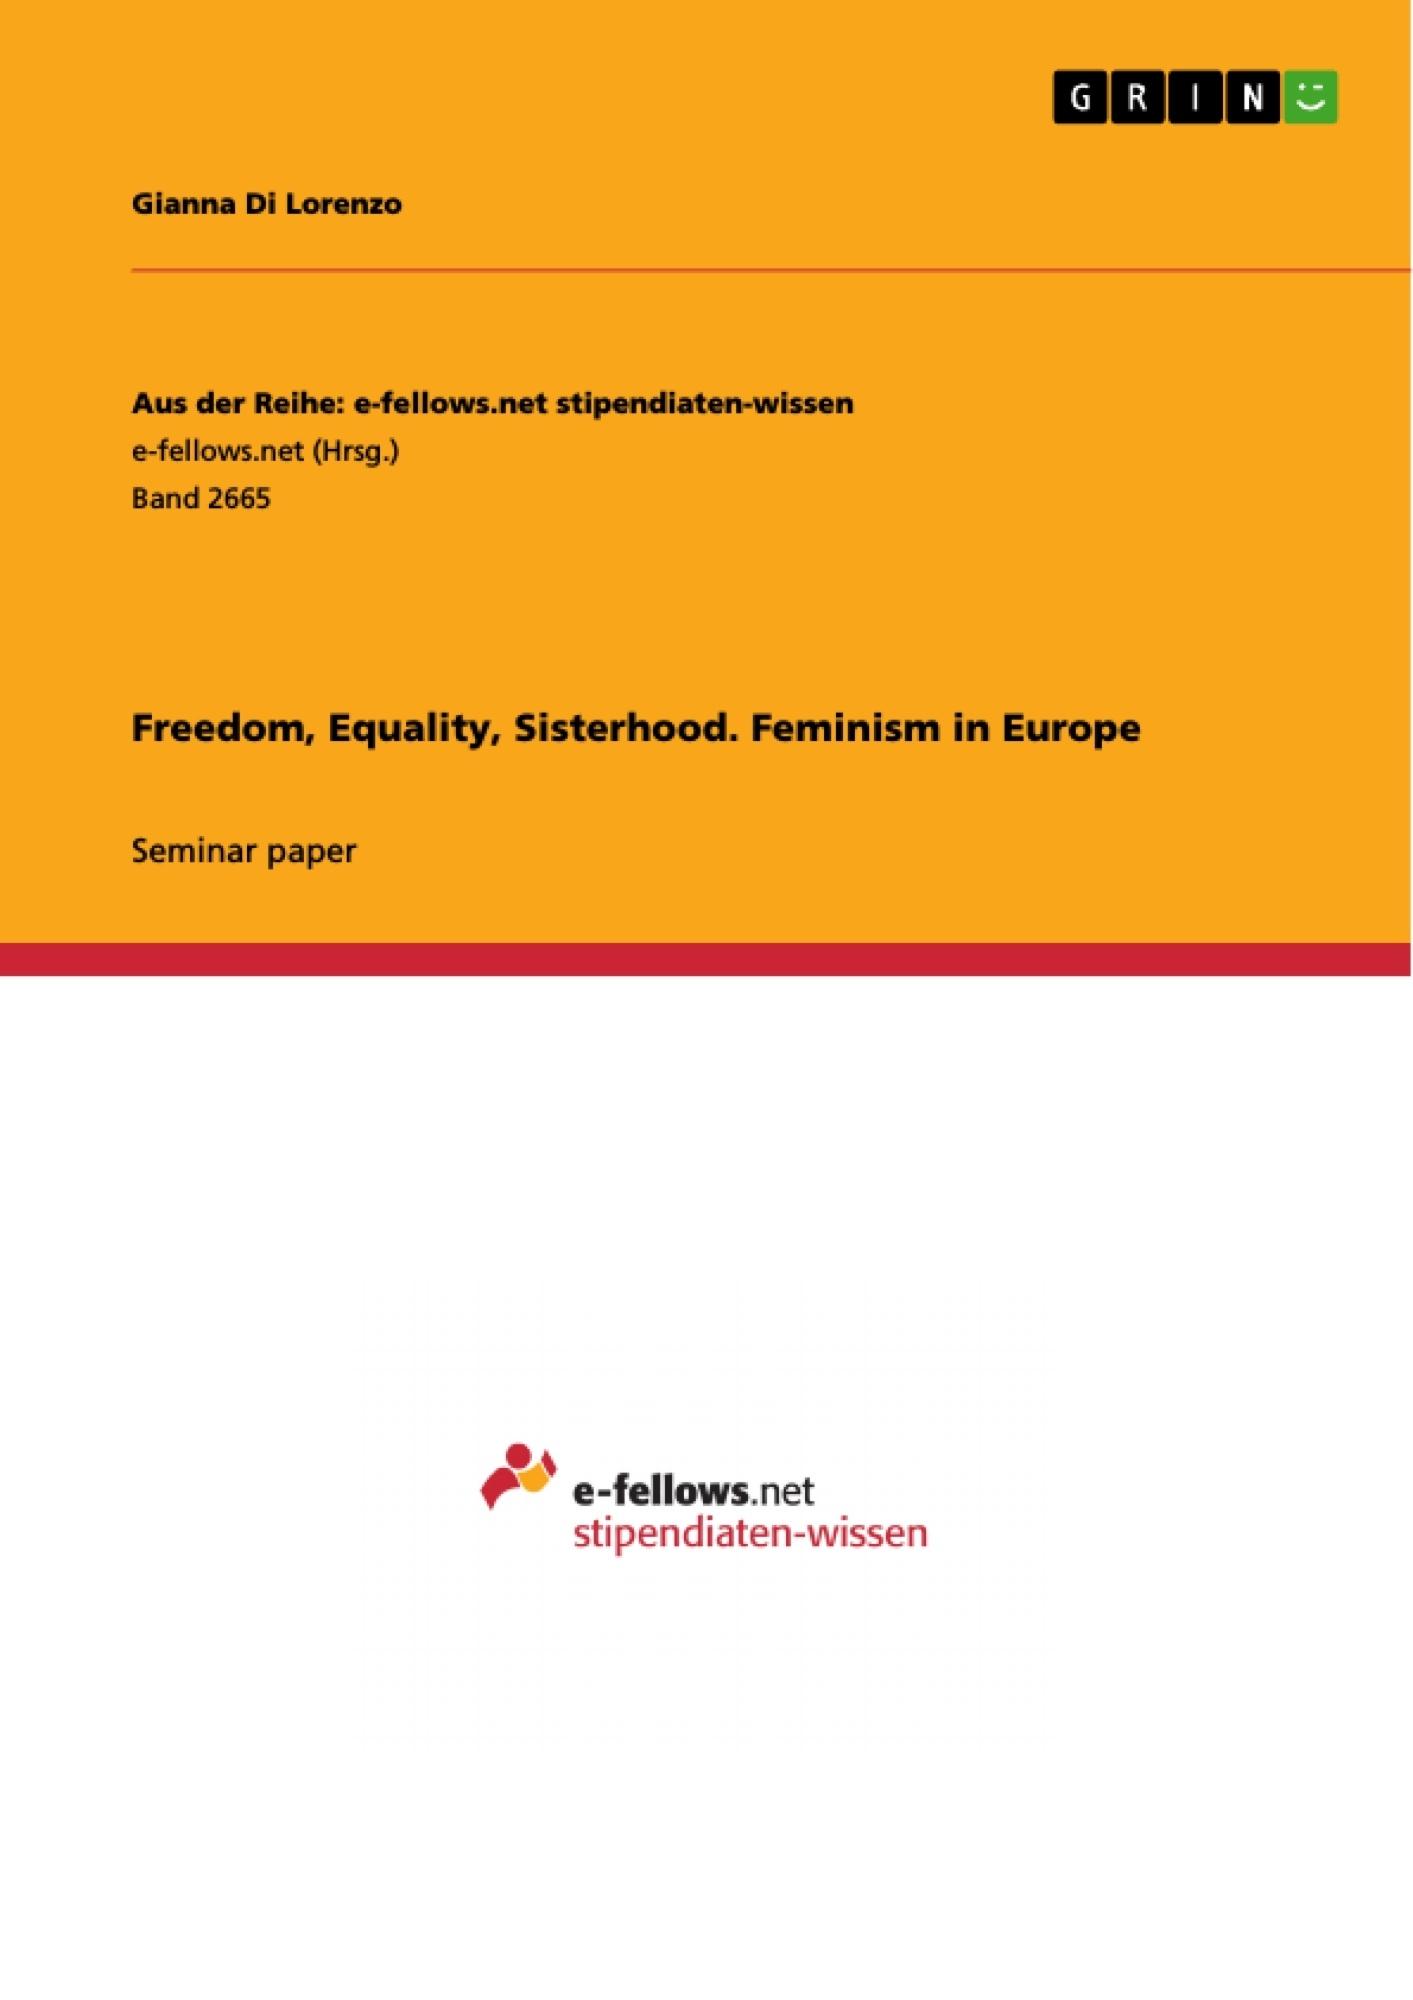 Title: Freedom, Equality, Sisterhood. Feminism in Europe